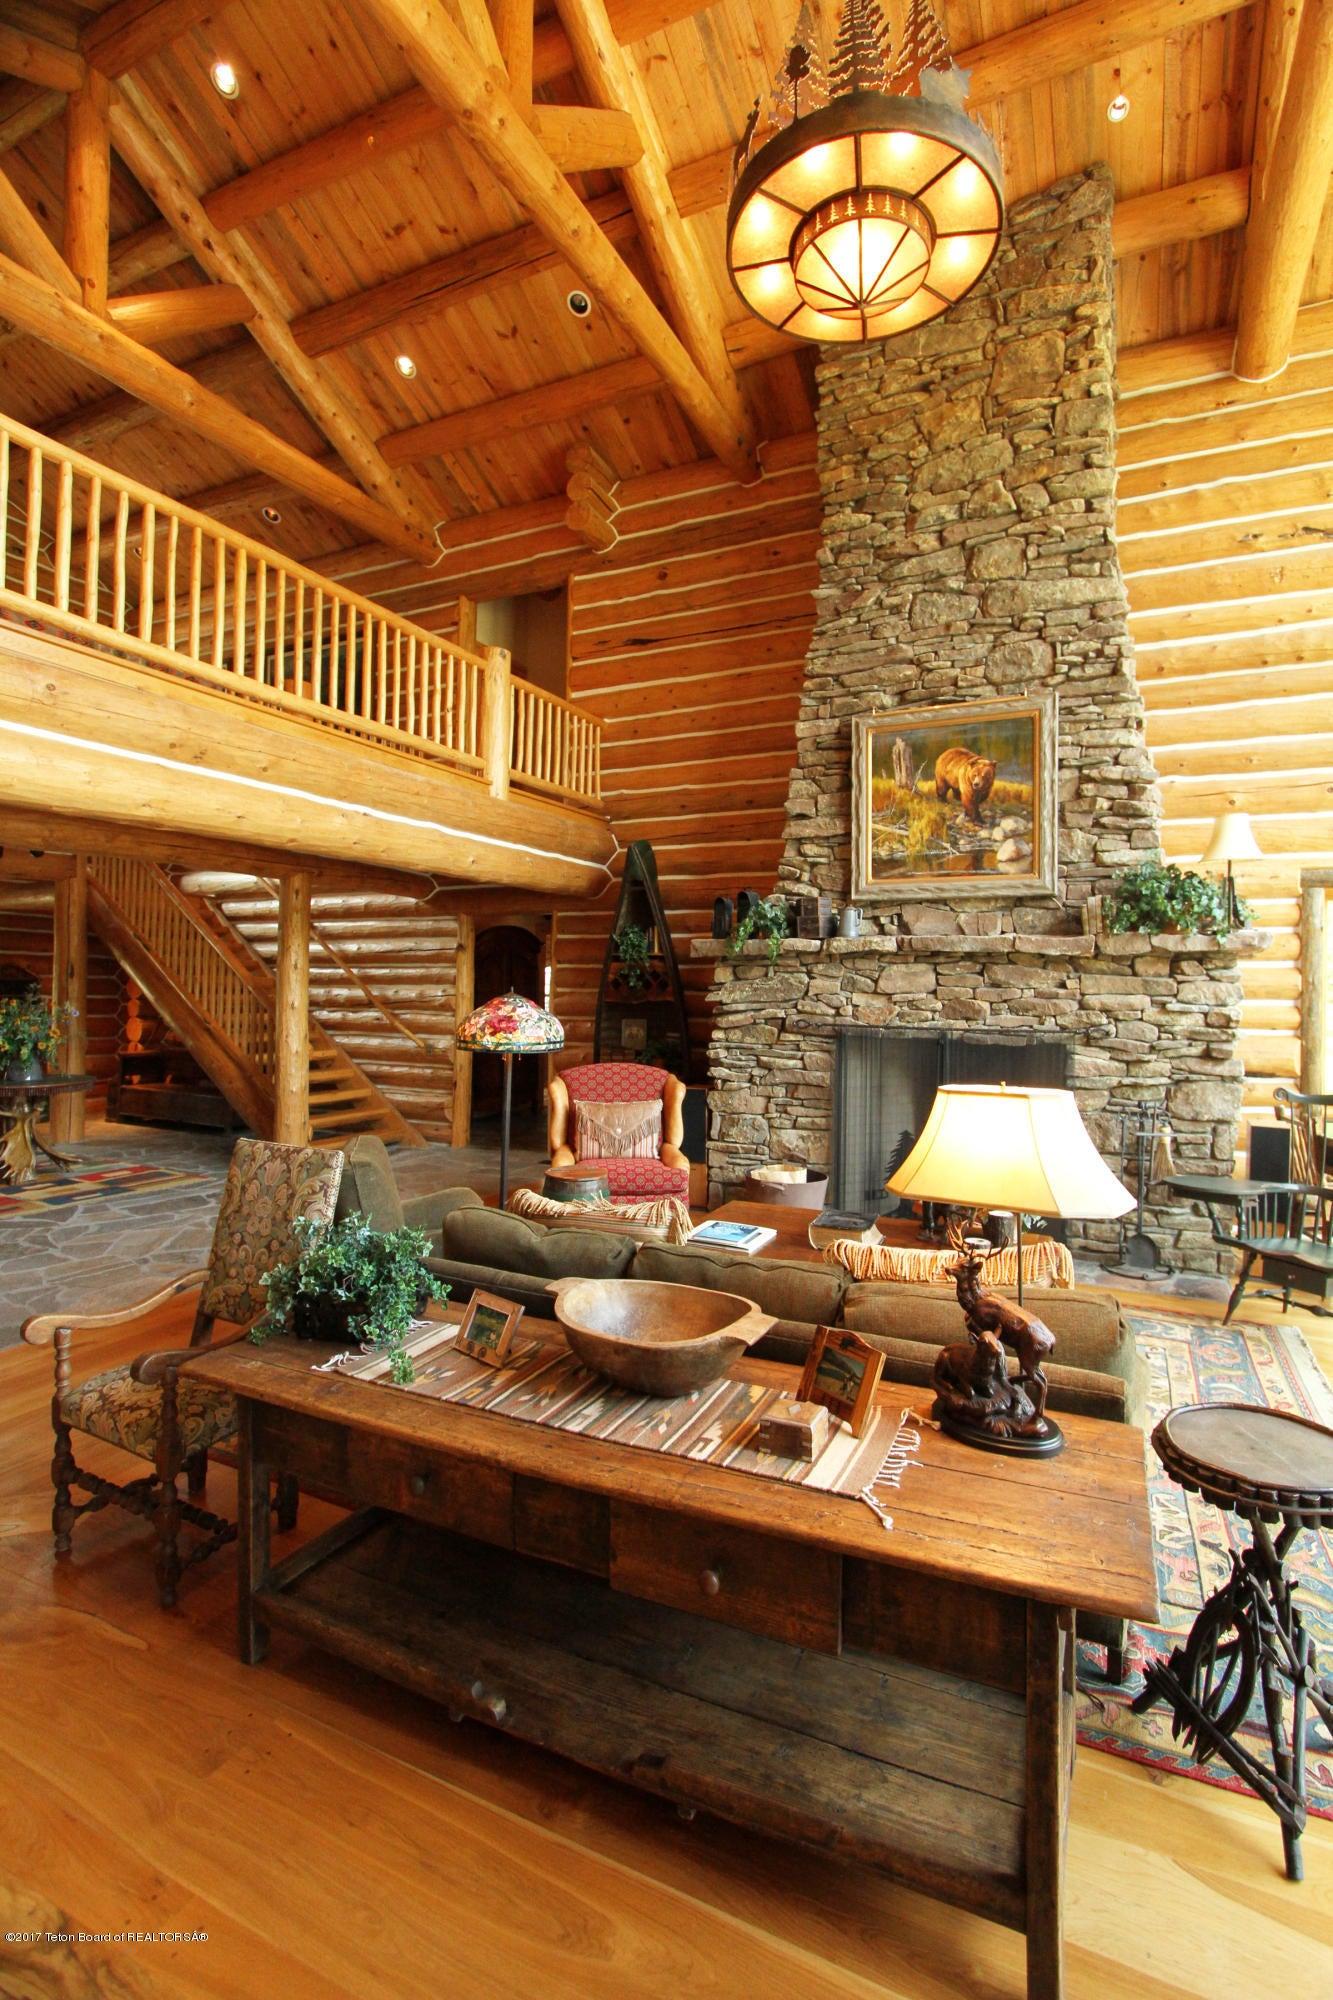 Womack Living Stone Fireplace 1 300 dpi